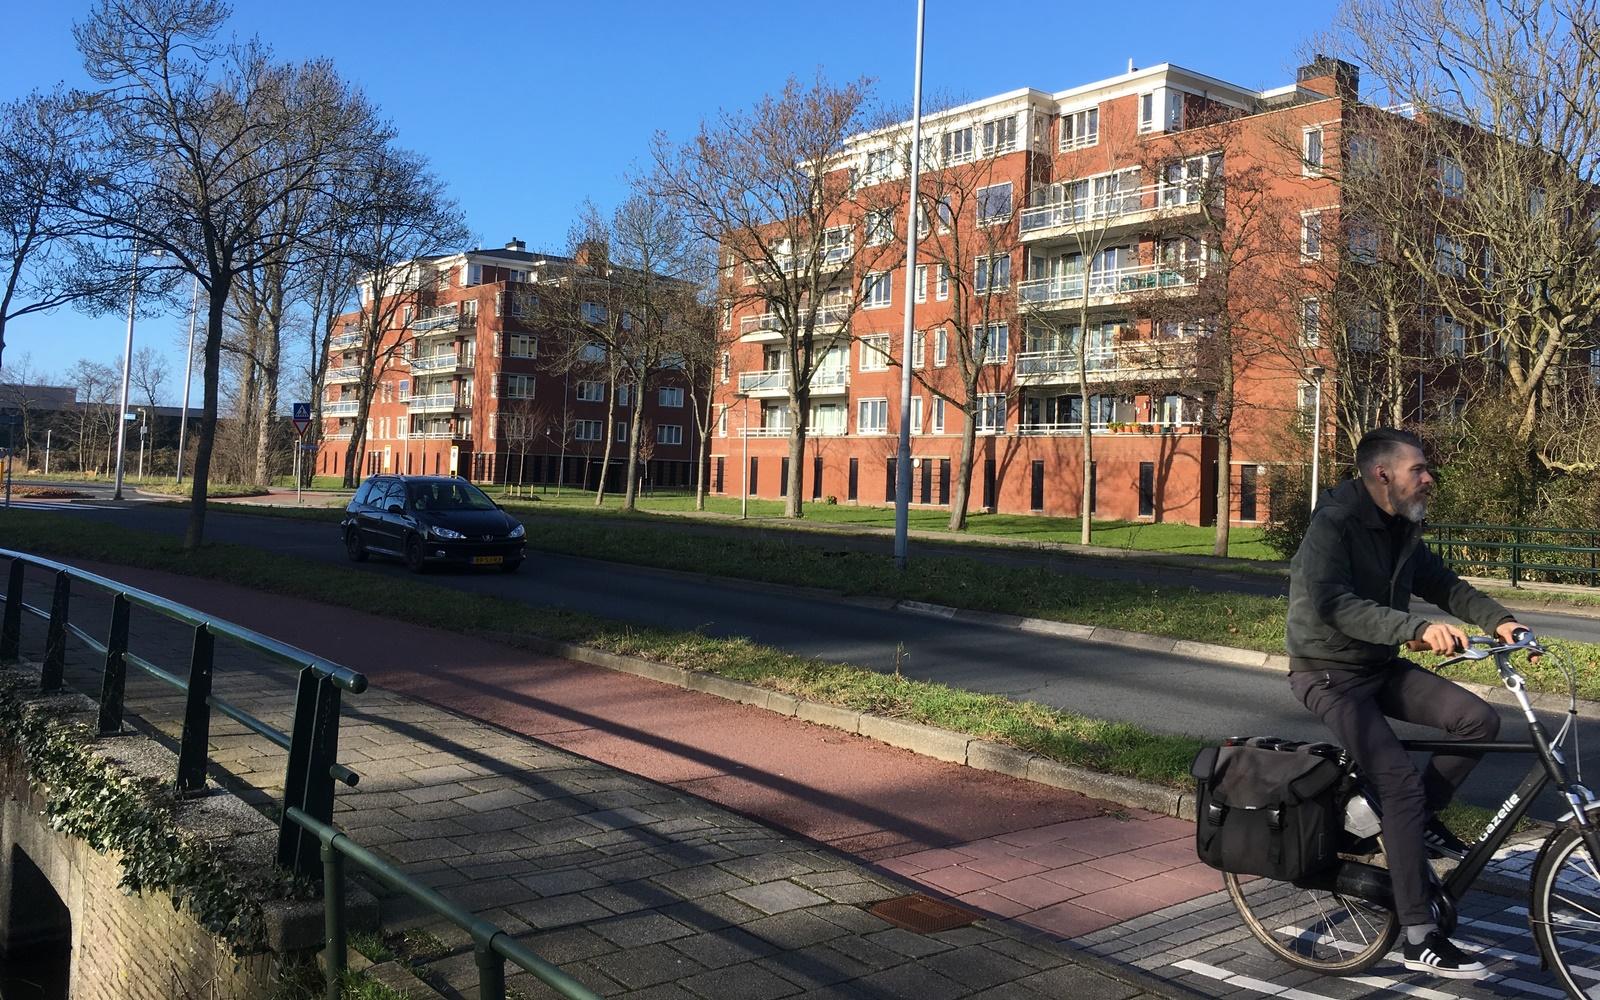 Voorkoming oververhitting nieuwbouwwoningen verplicht